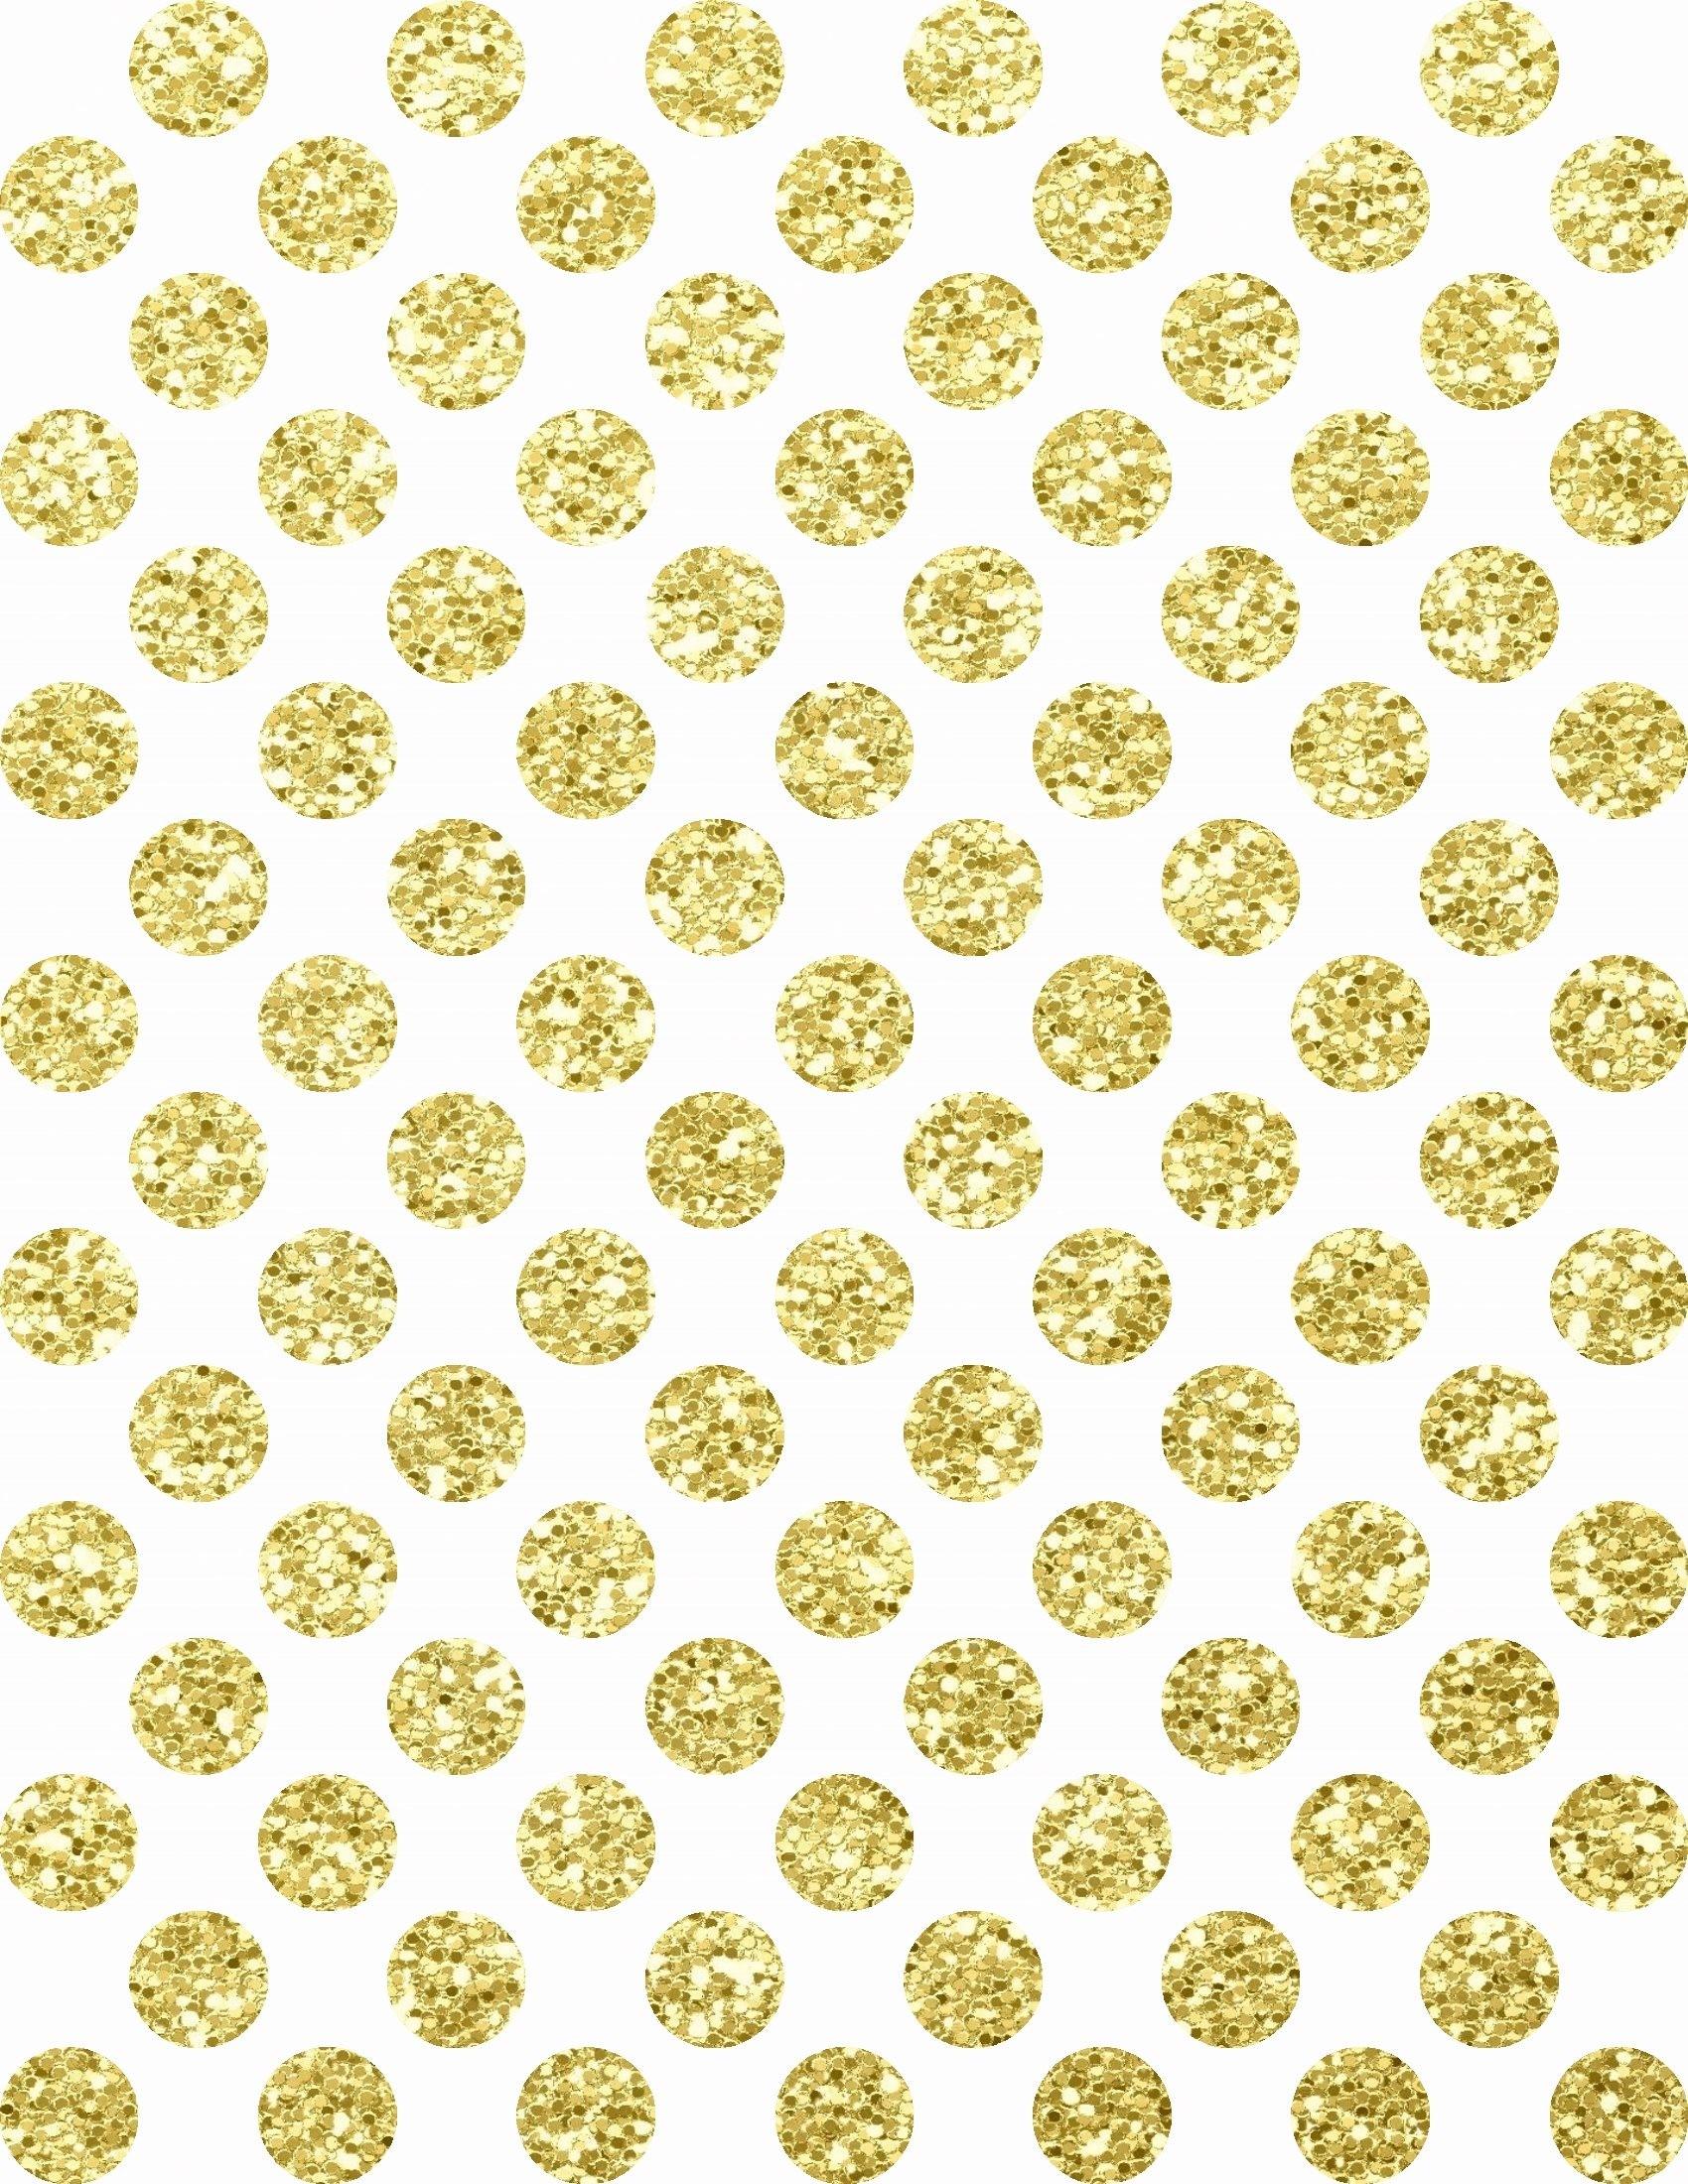 Gold Glitter on White